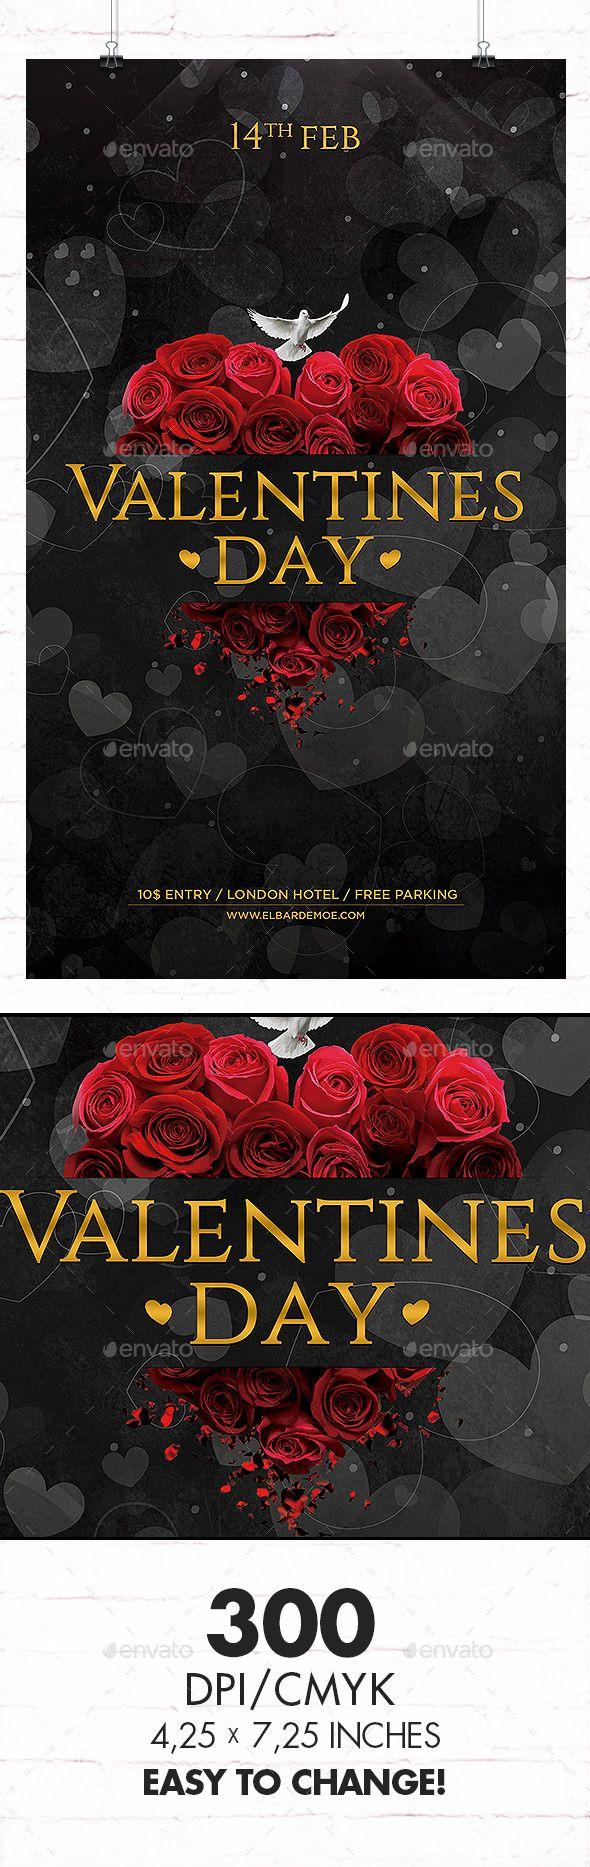 Valentines Day Flyer Template #design Download: http://graphicriver.net/item/valentines-day-flyer/10038866?ref=ksioks